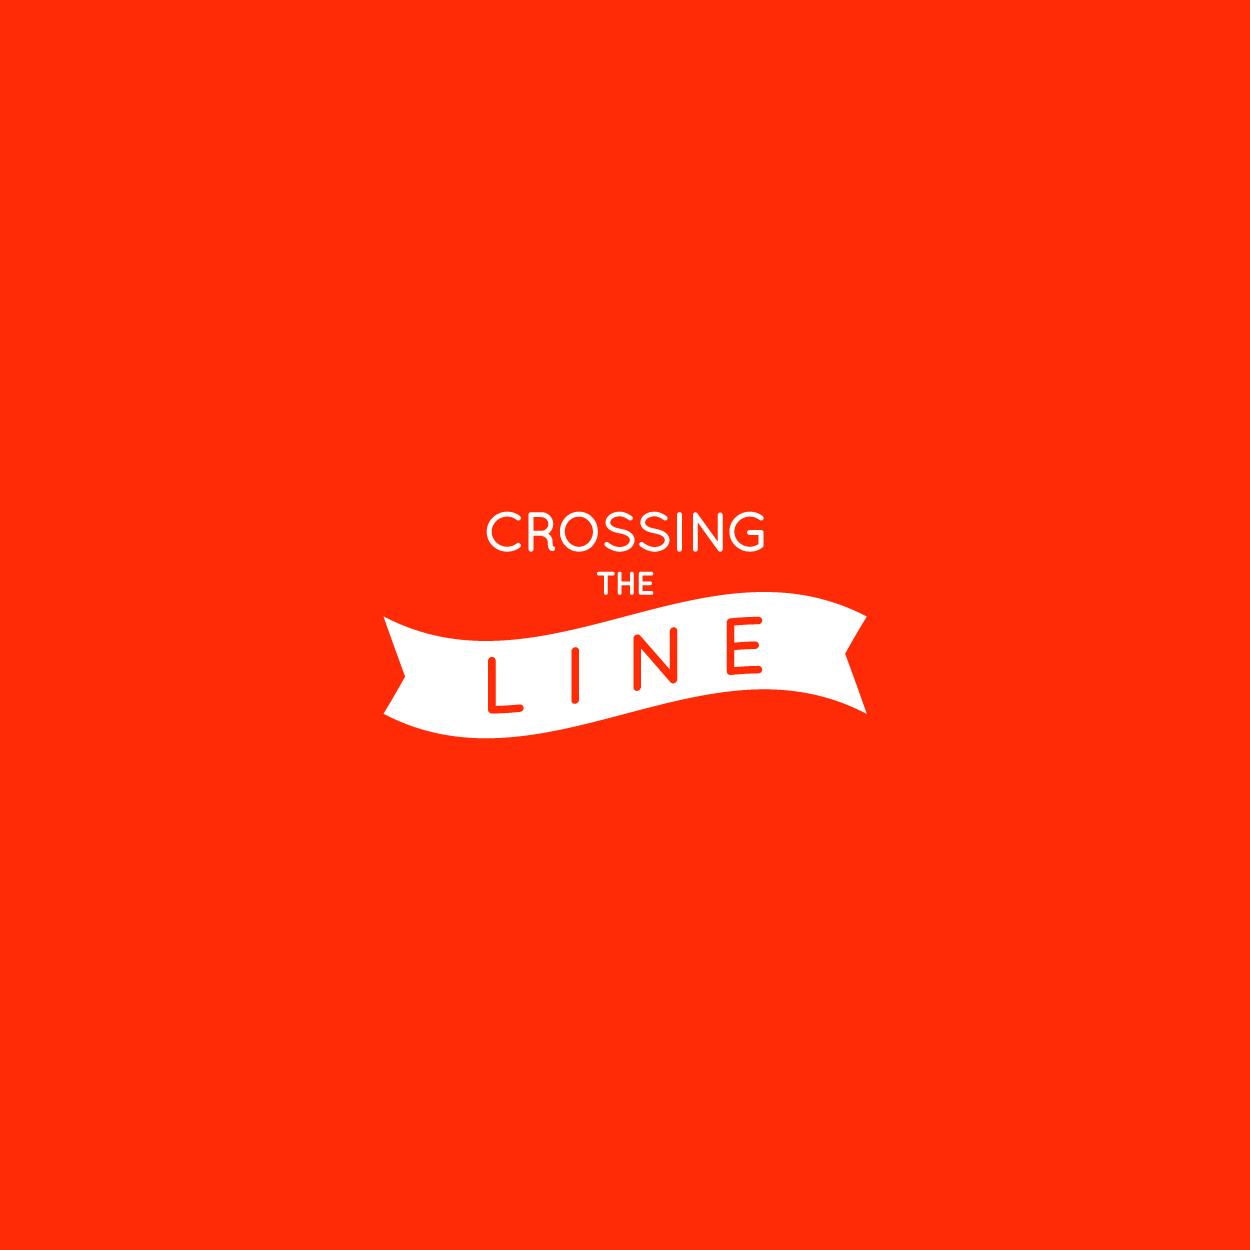 crossing-the-line-logo-bg